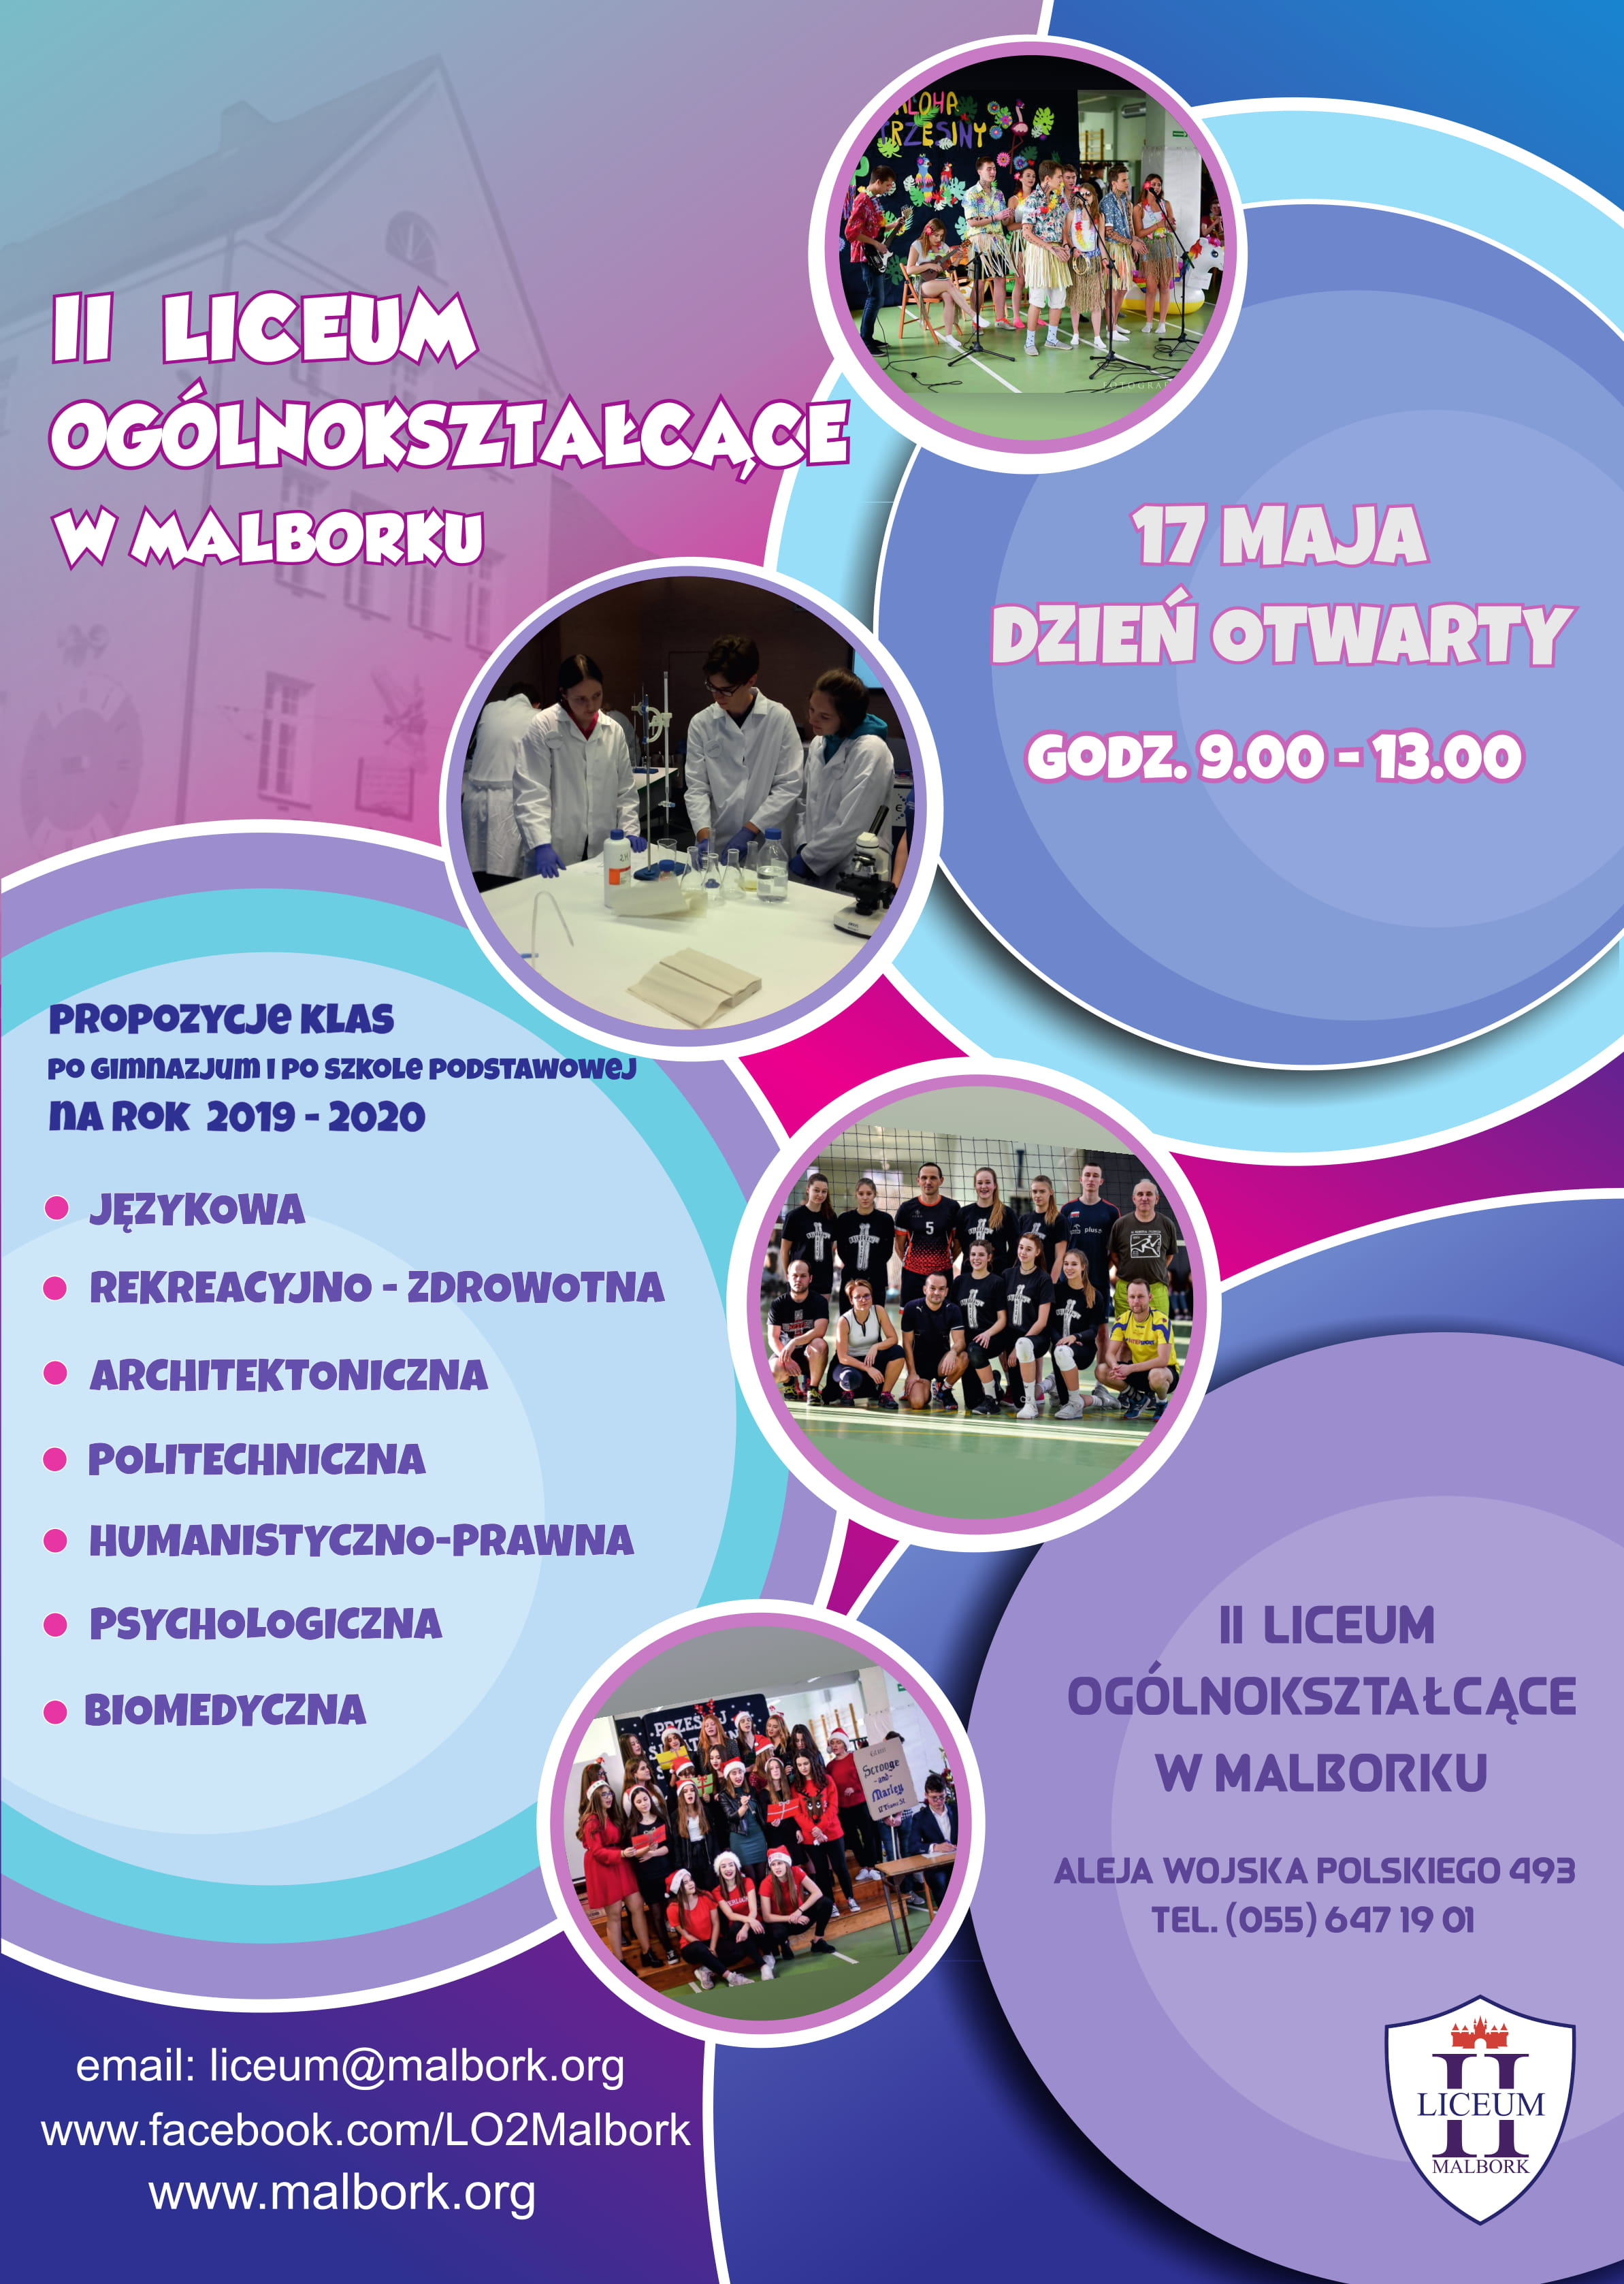 http://m.82-200.pl/2019/05/orig/2-liceum-plakat-pdf-1-4530.jpg